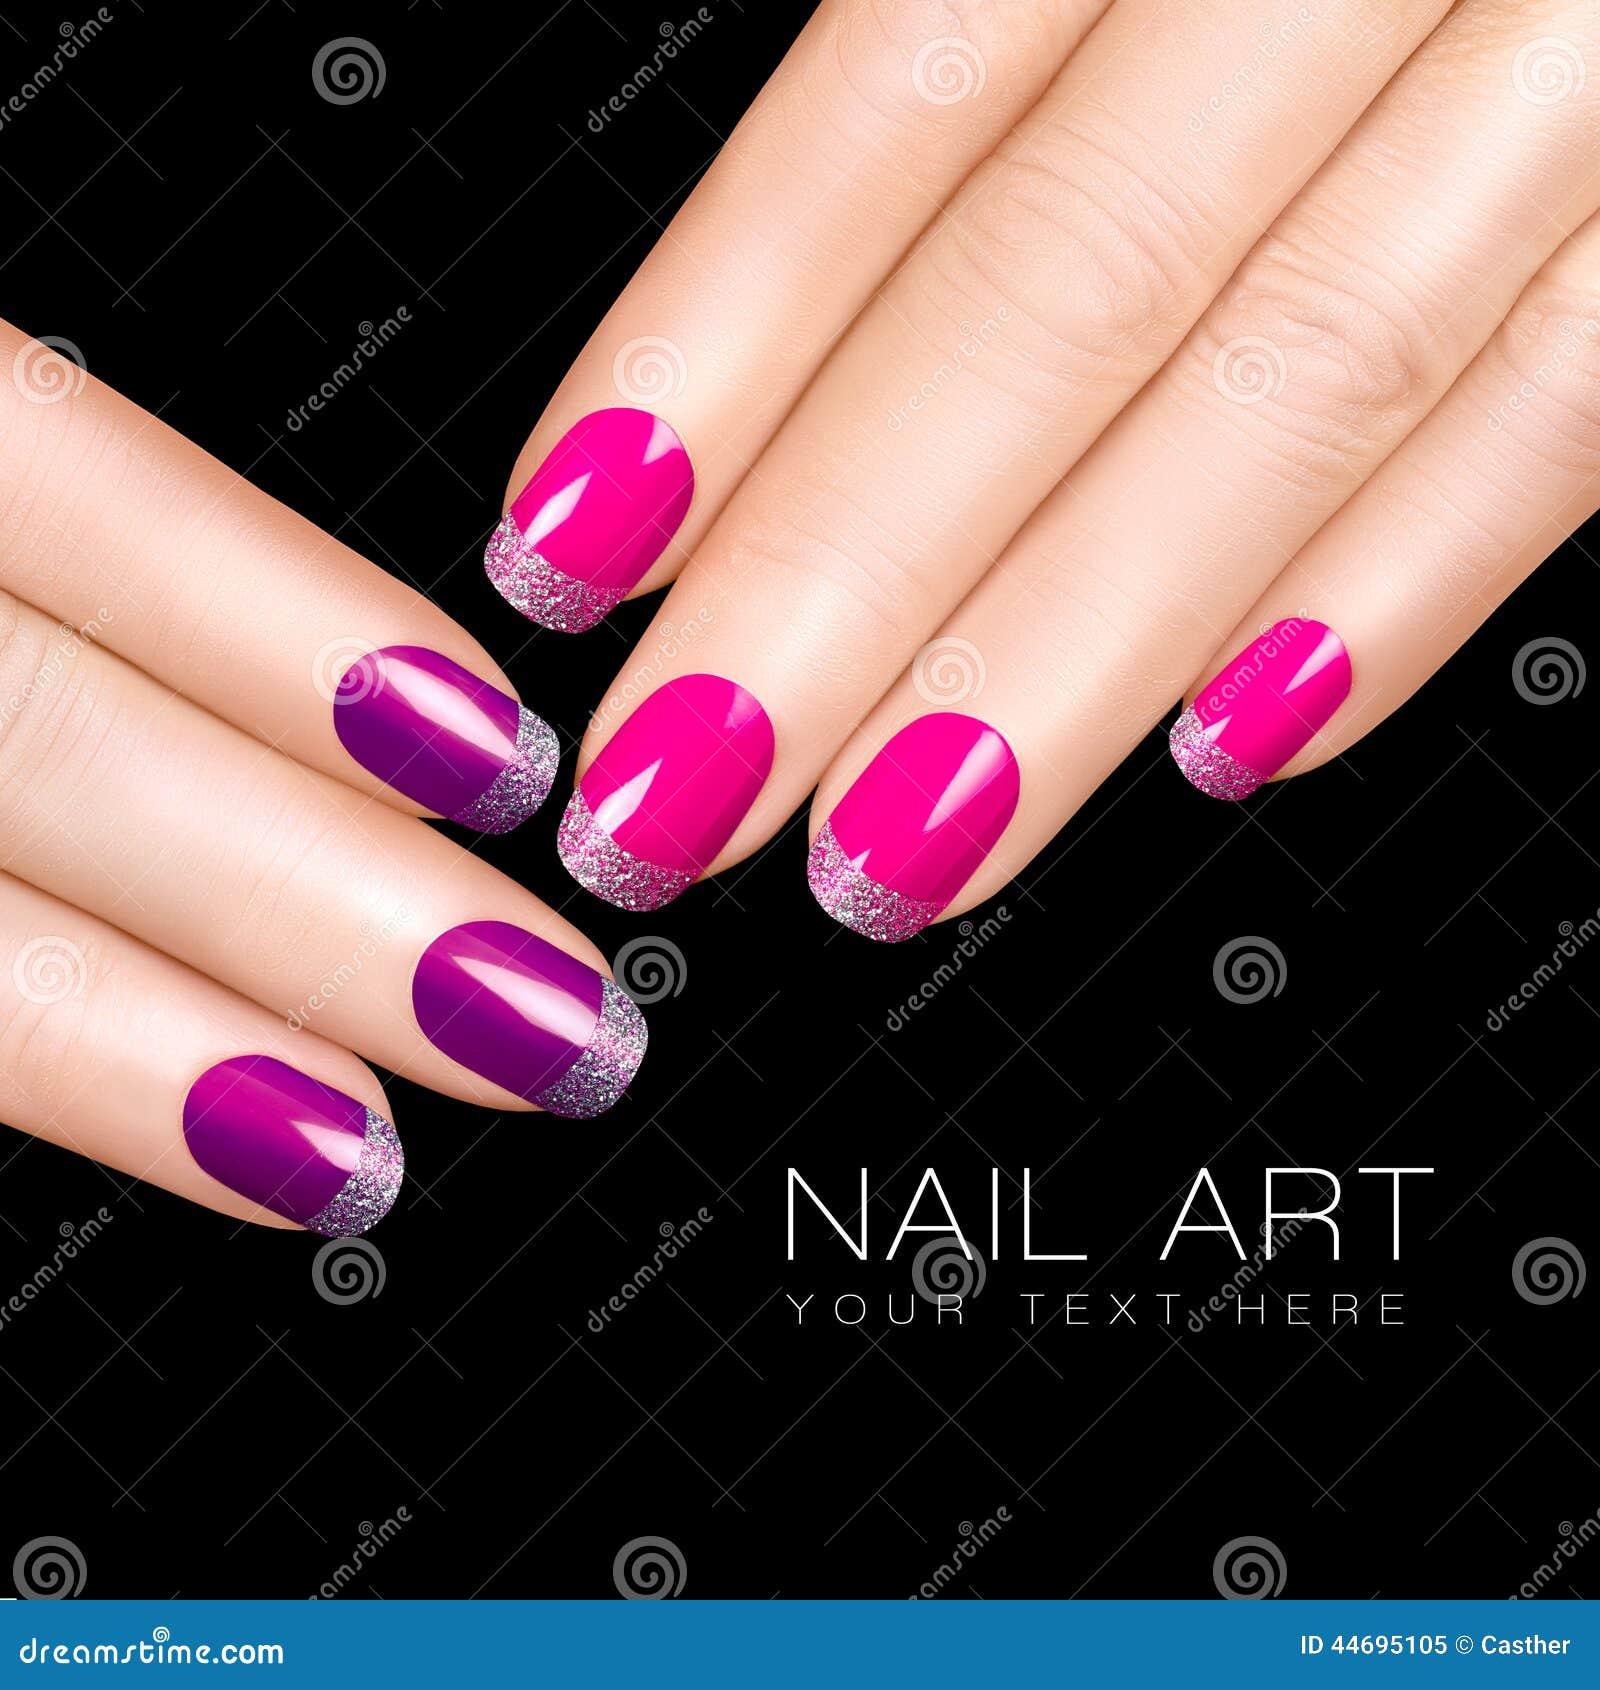 holiday nail art luxury nail polish glitter nail stickers in purple